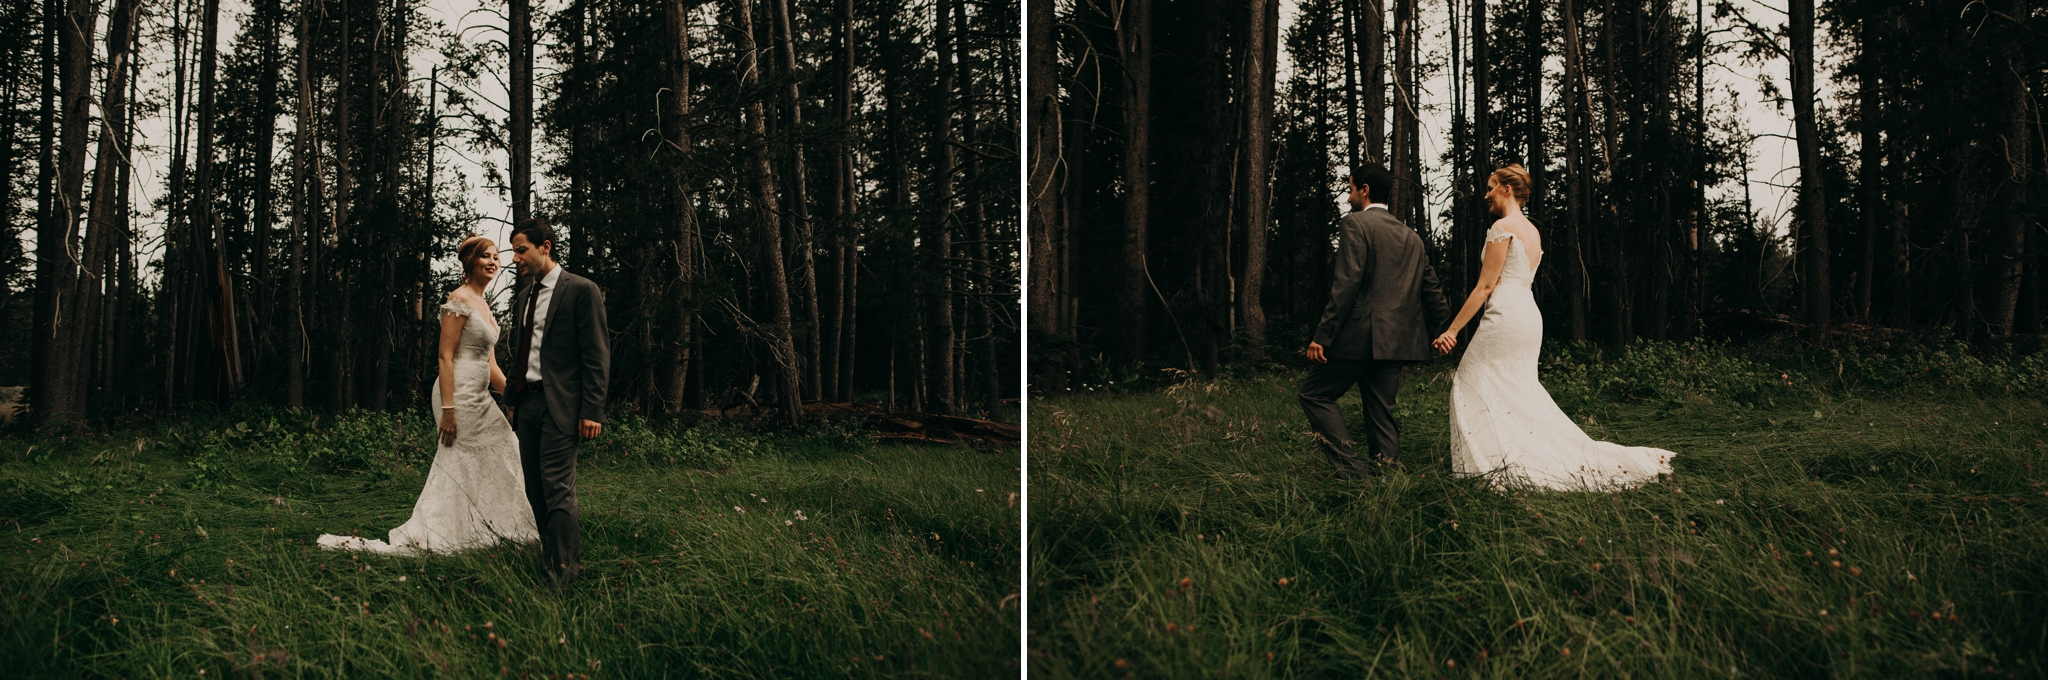 redwood-wedding5.jpg